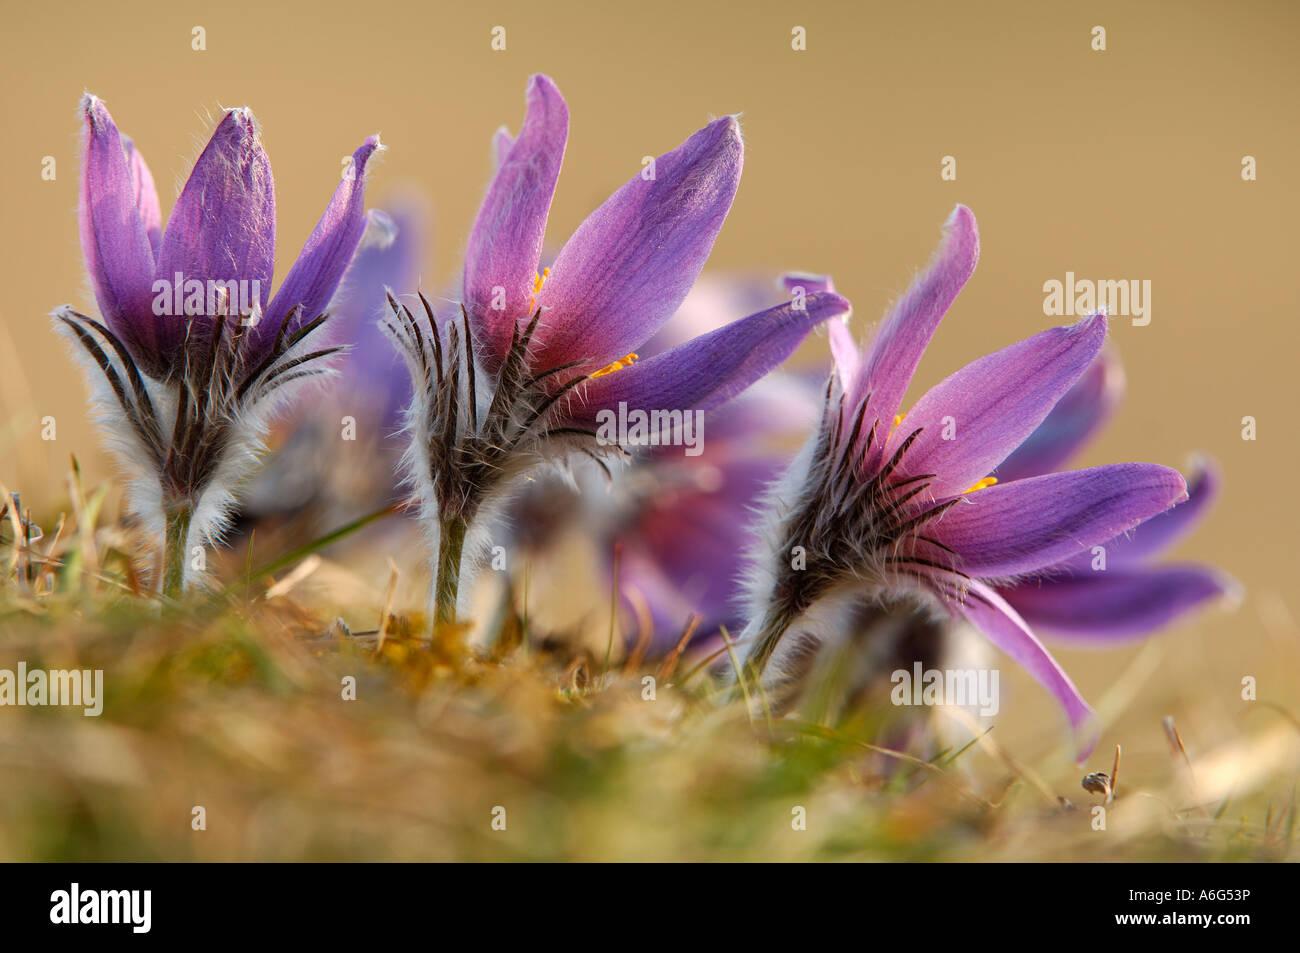 Pasque flower (Pulsatilla vulgaris) - Stock Image